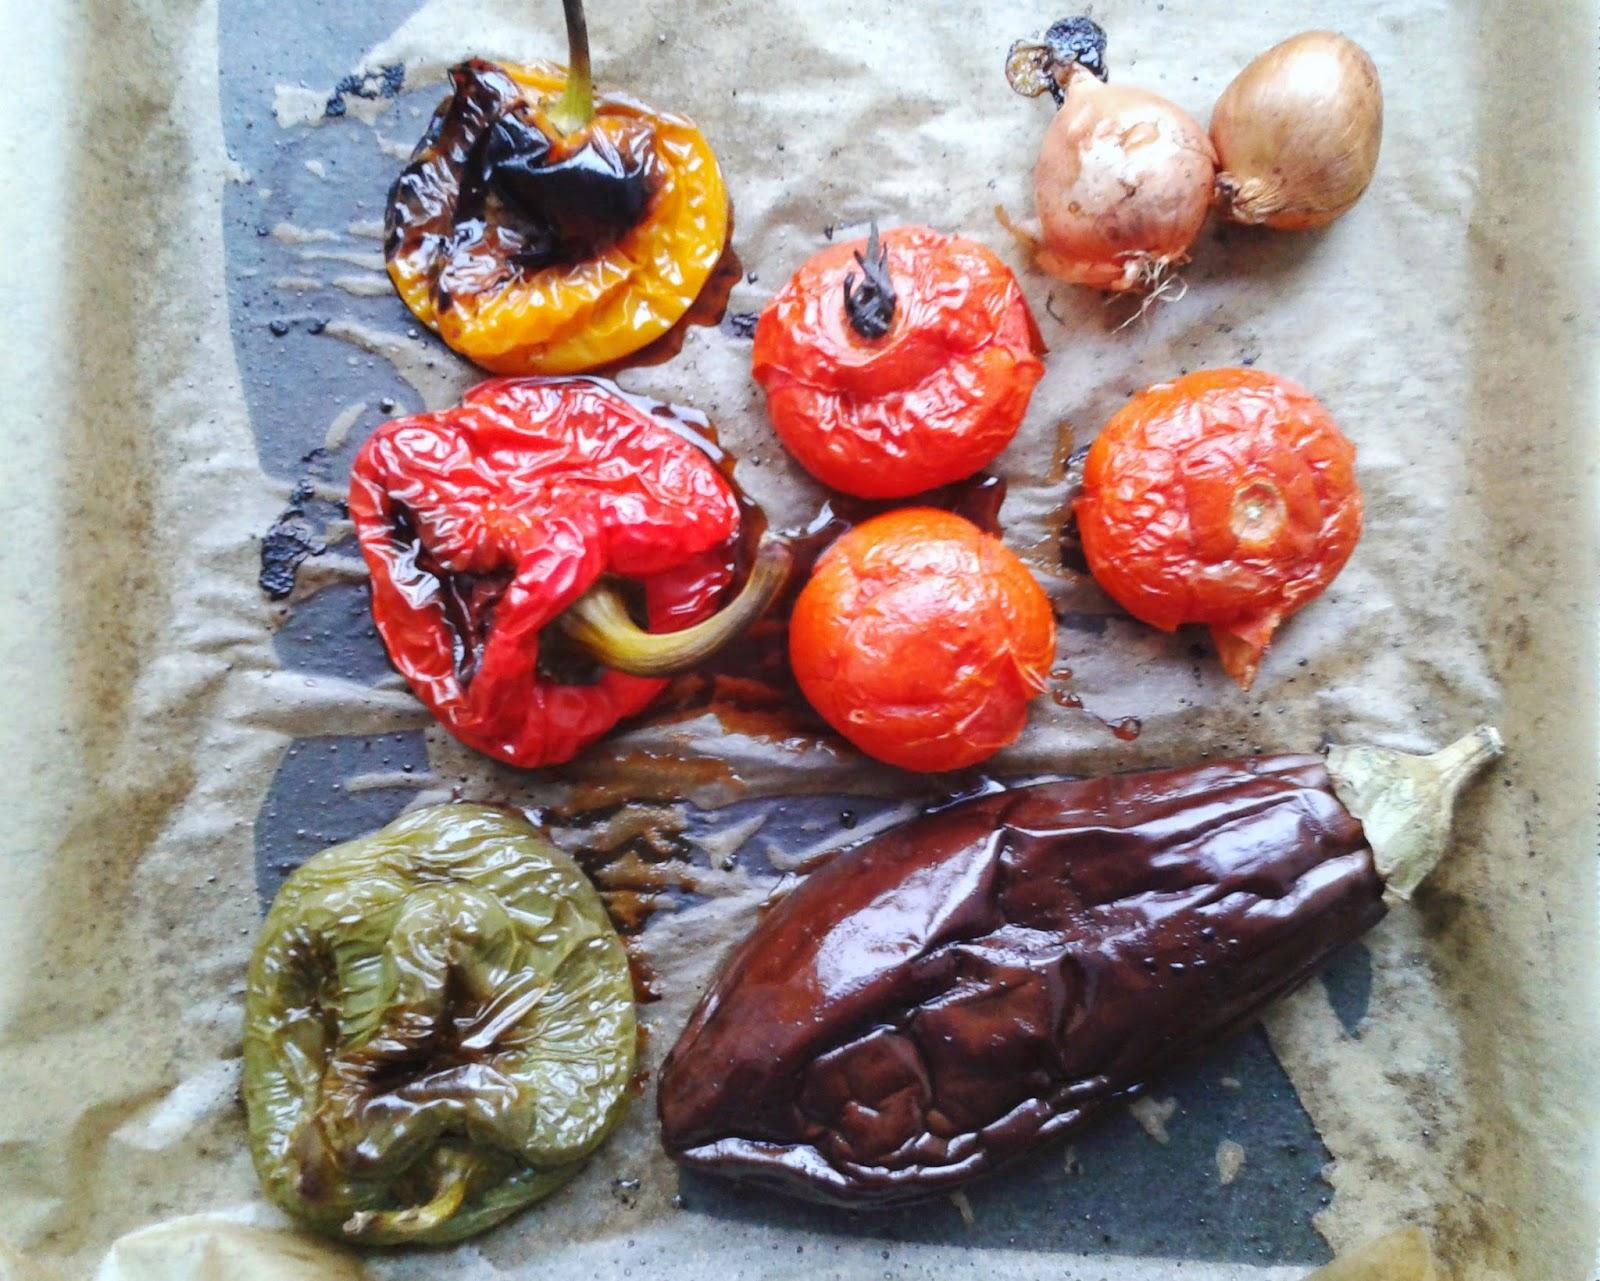 Mediterranean Roasted Veggies